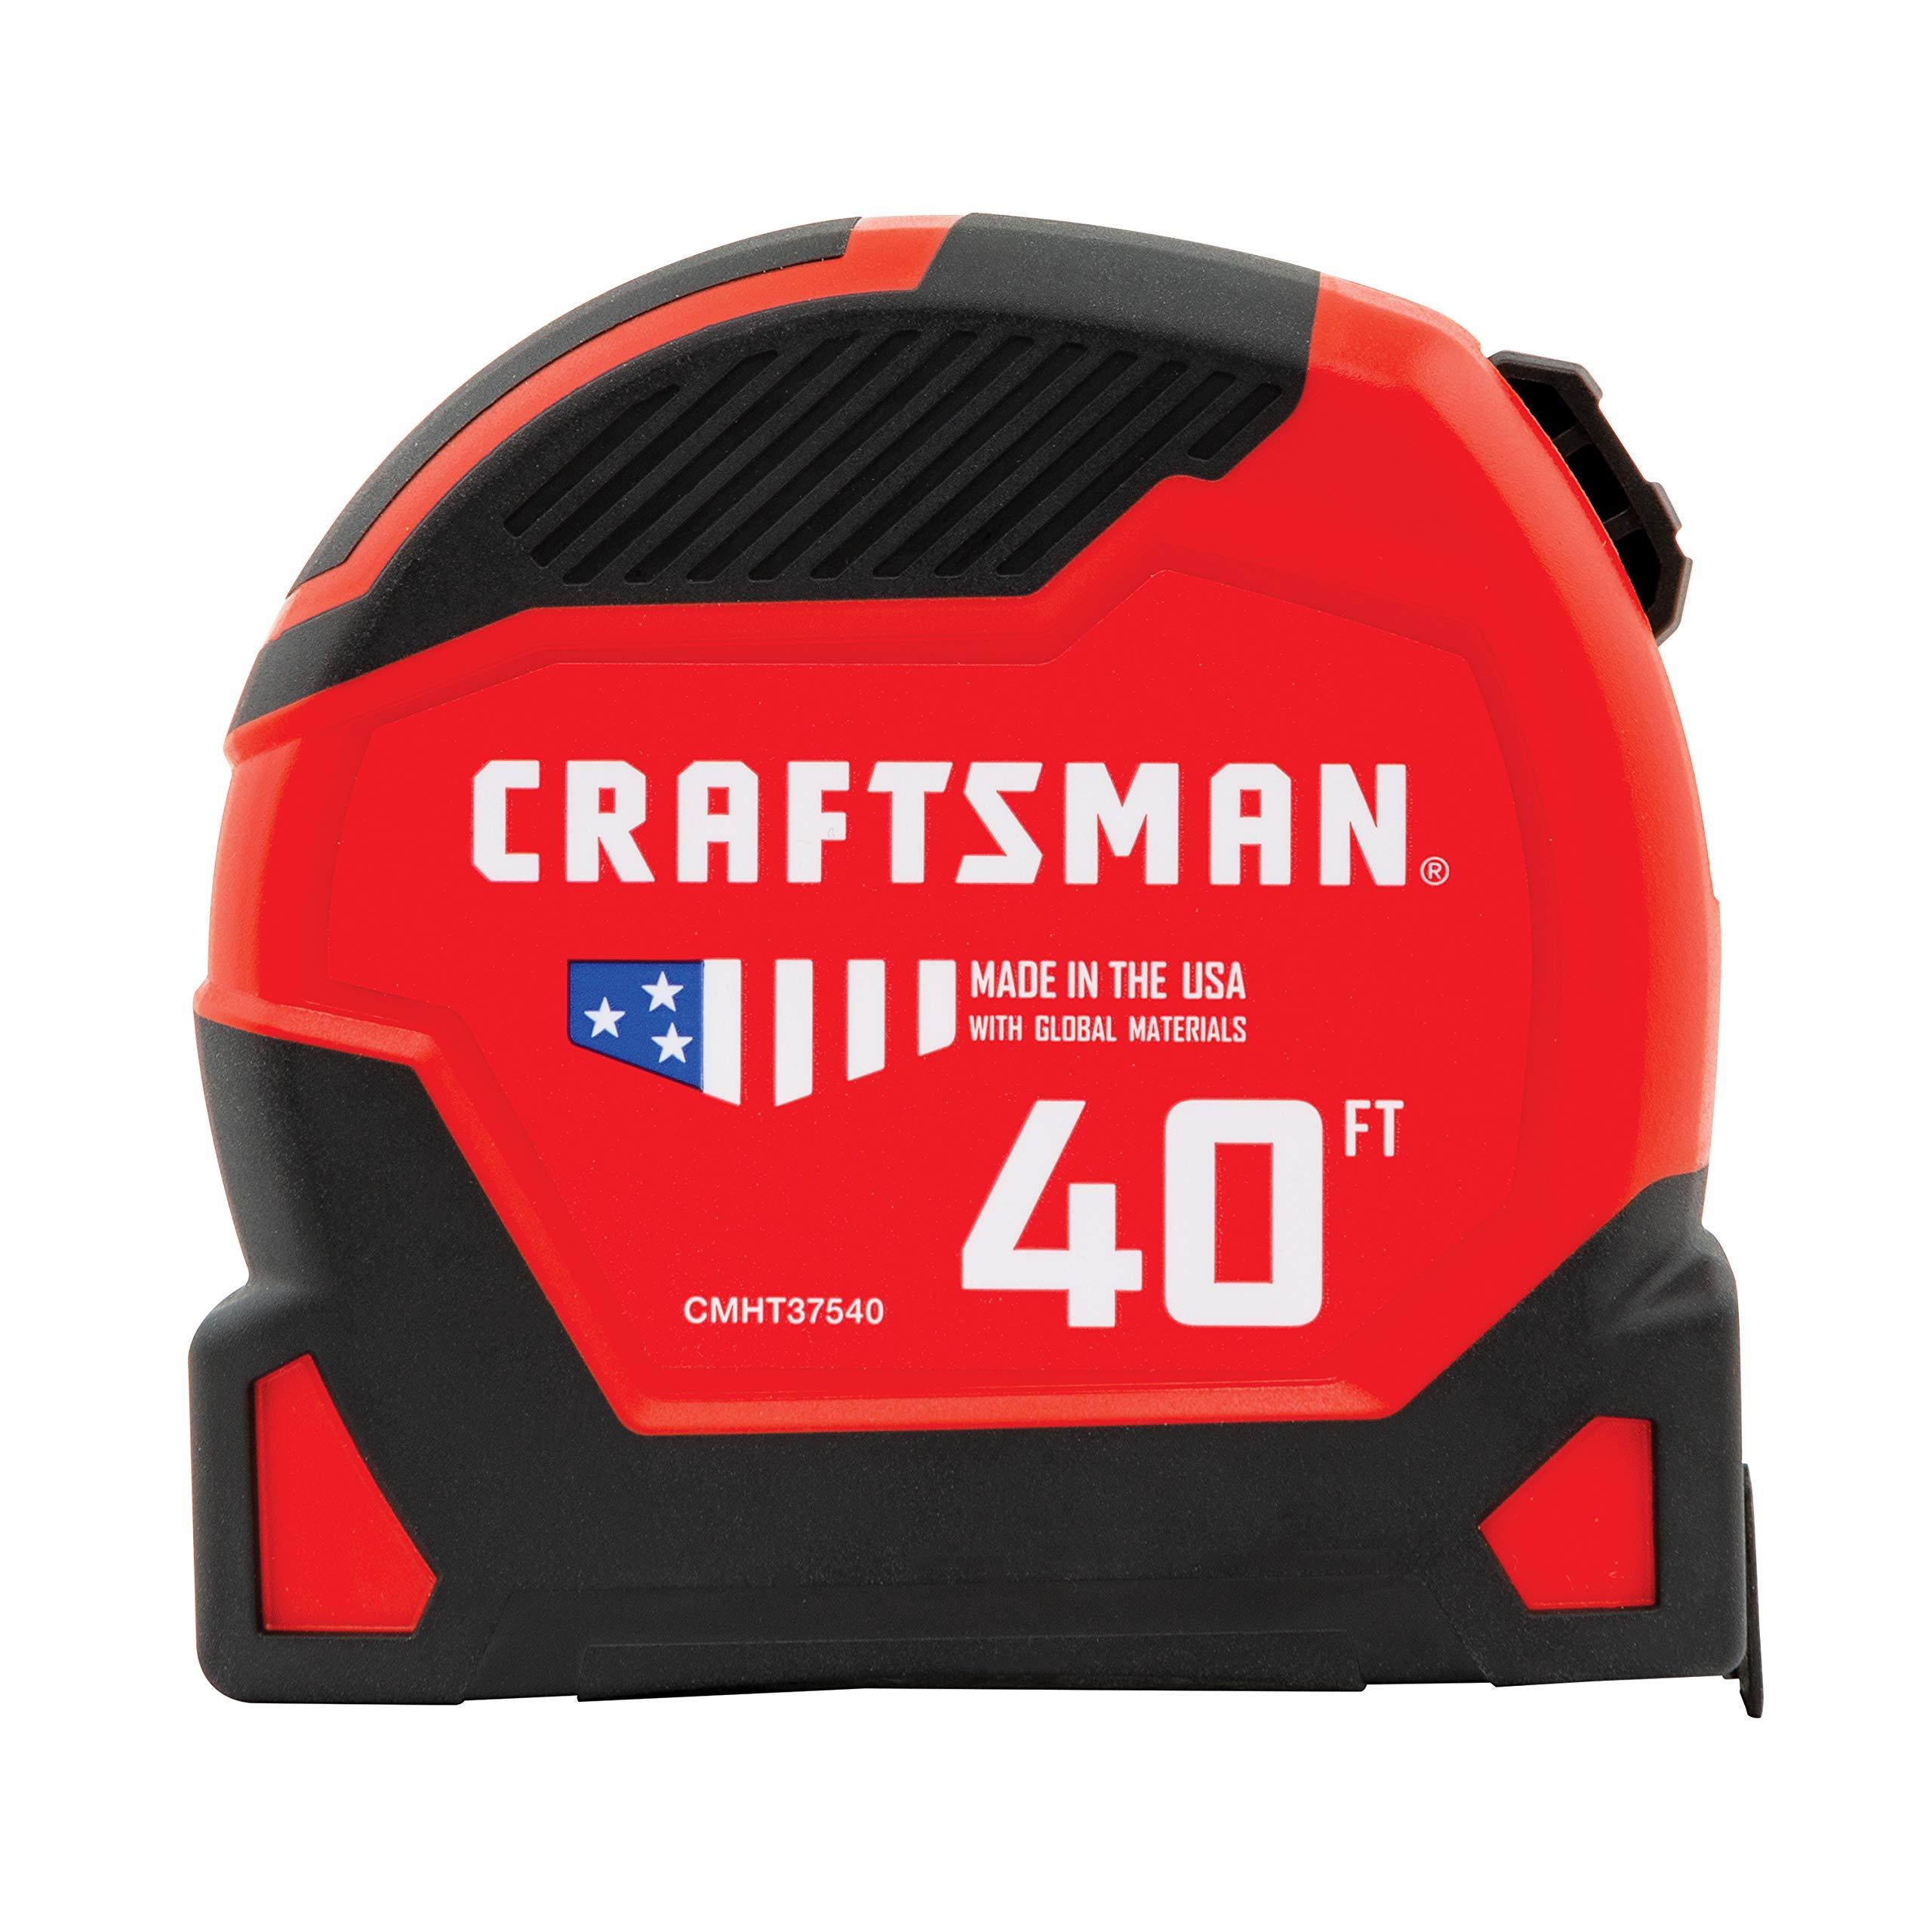 CRAFTSMAN CMHT37540S Pro-11 1.25 x 40' Tape